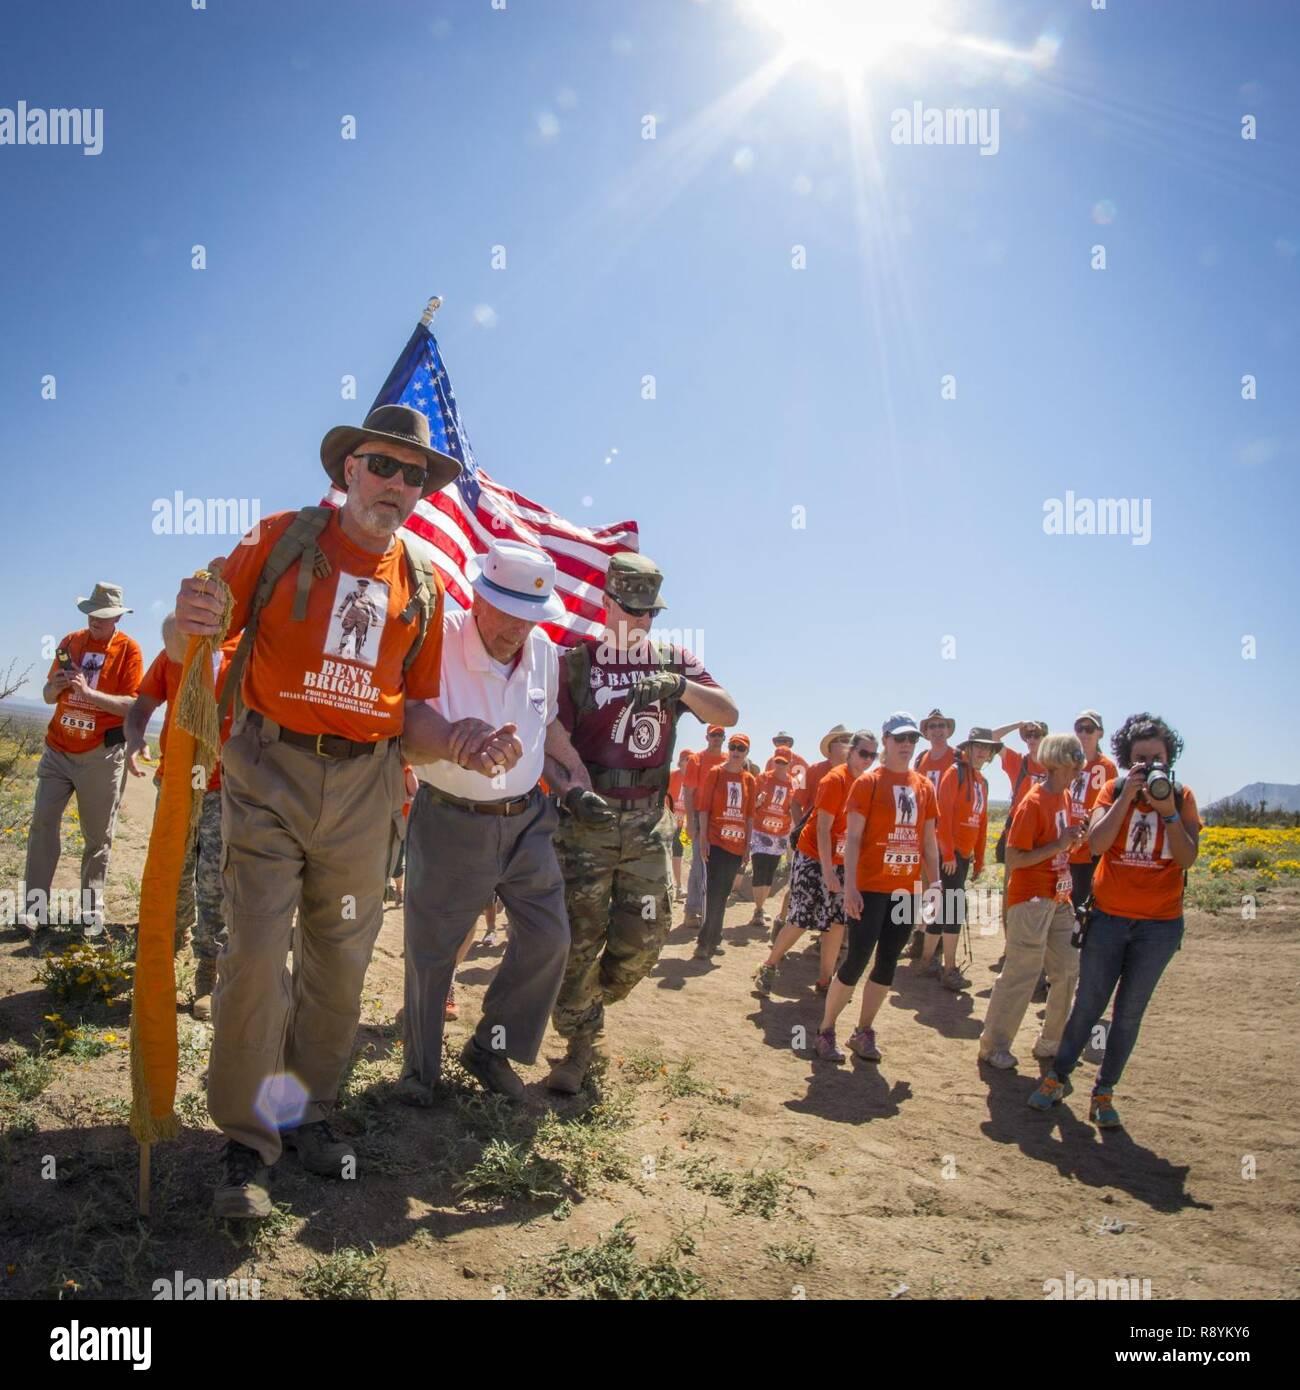 Ben Skardon 99 A Survivor Of The Bataan Death March Walks Under Blazing New Mexico Sun Aided By Members His Loyal Support Team Bens Brigade